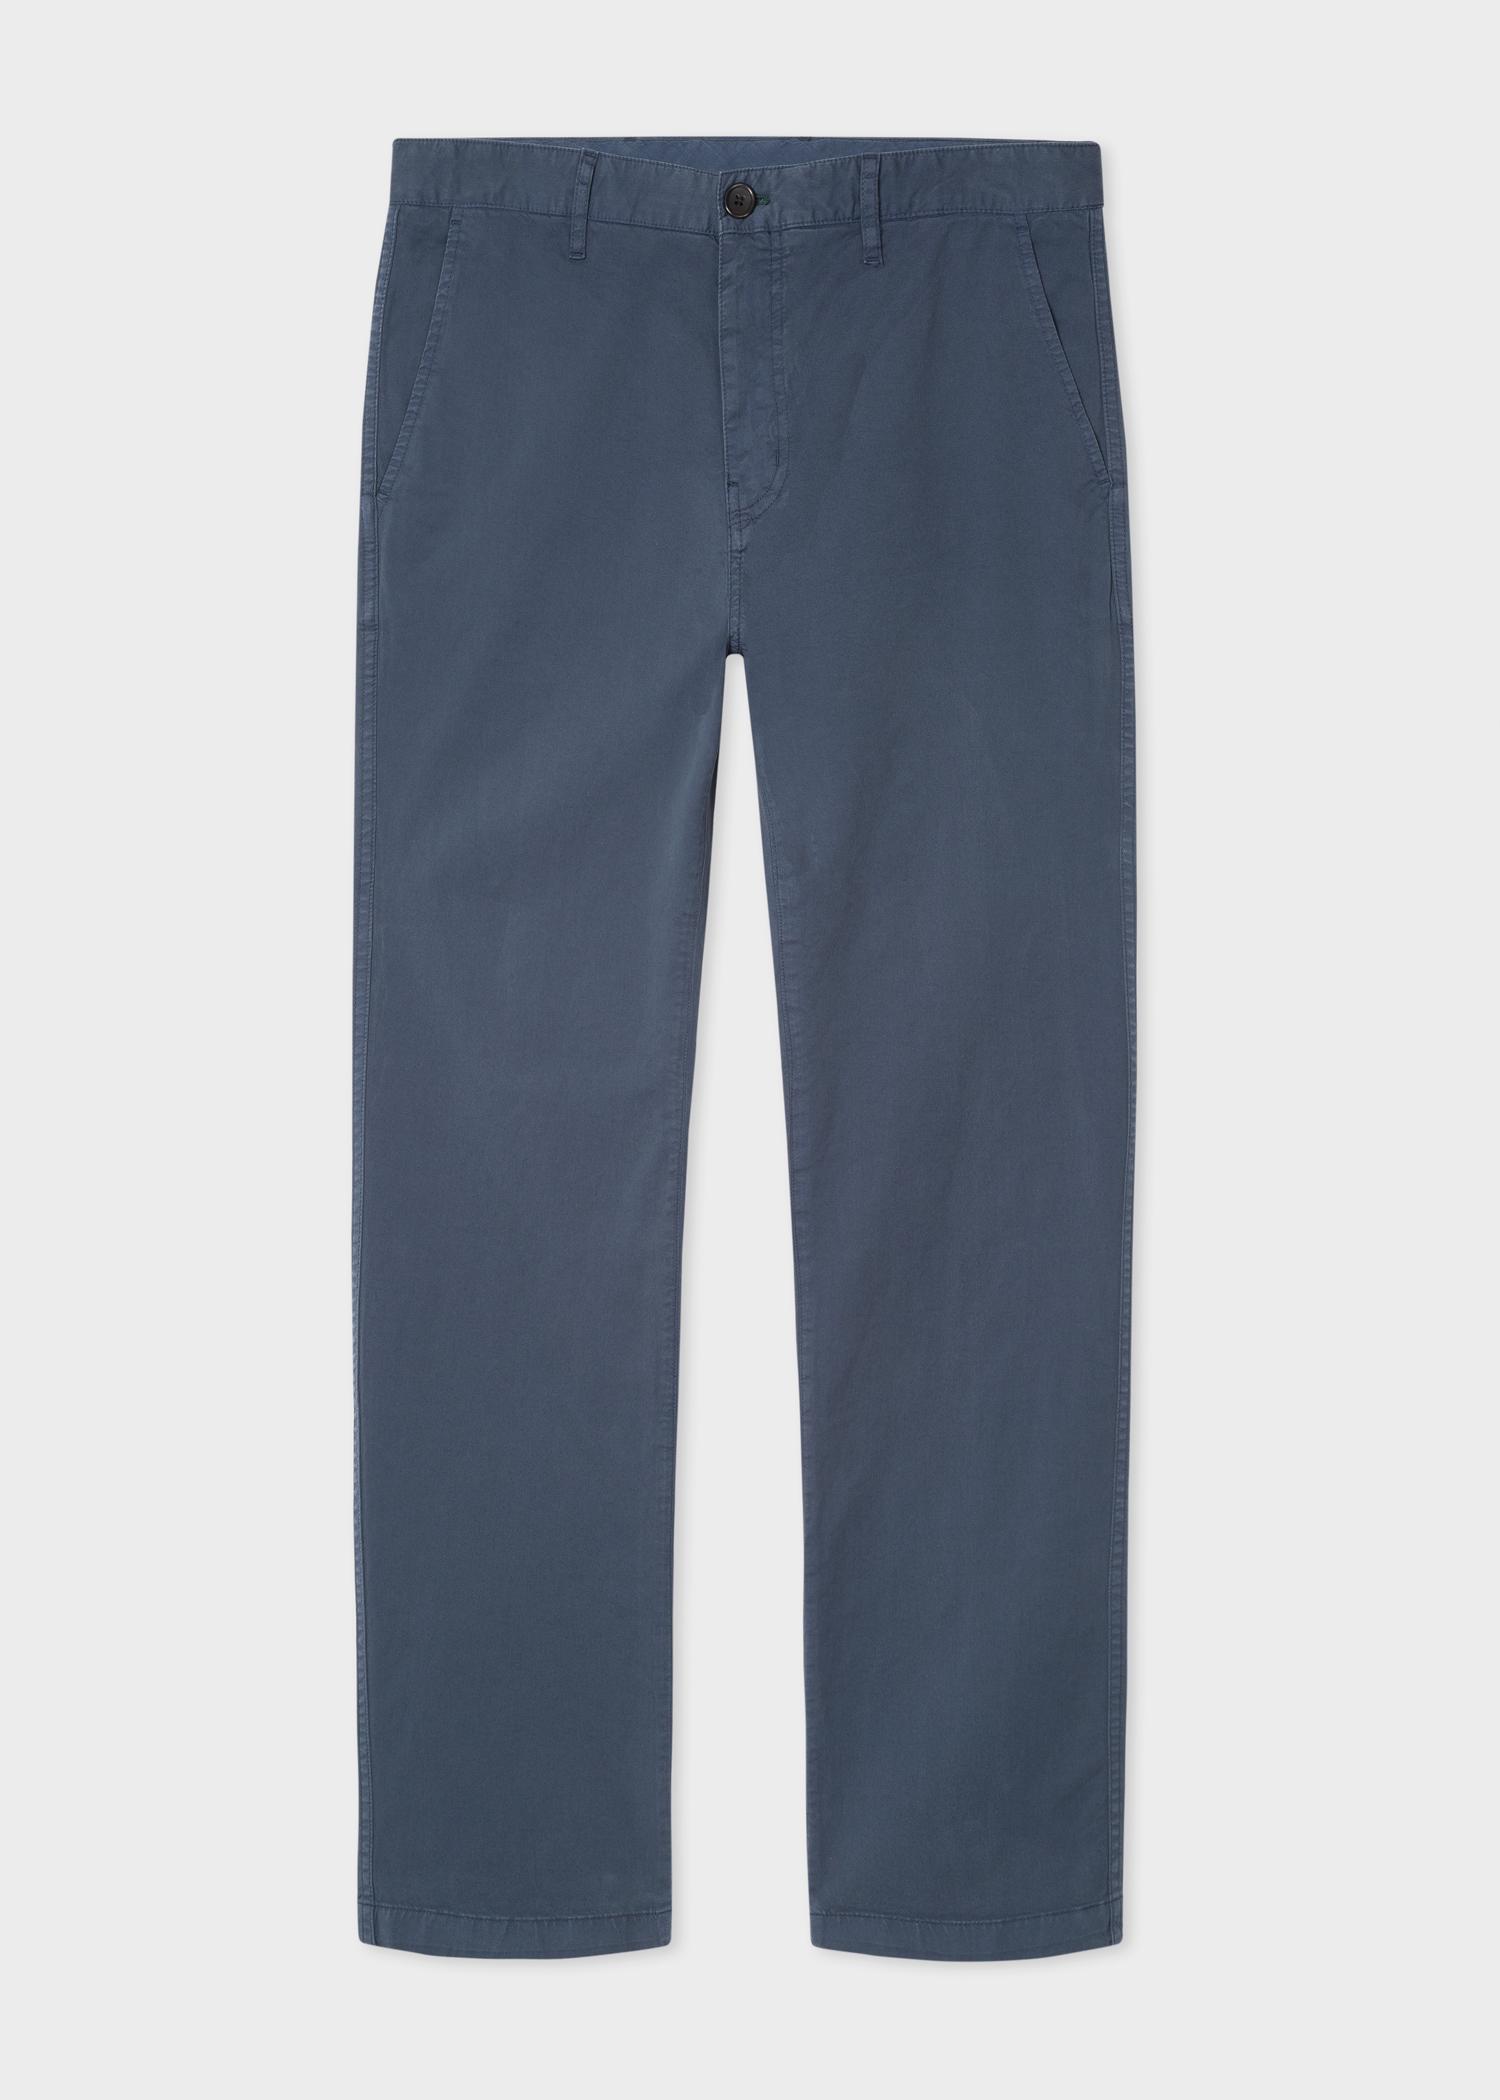 7a6c3d1428b Front View - Men's Slim-Fit Light Slate Blue Stretch Pima-Cotton Chinos Paul